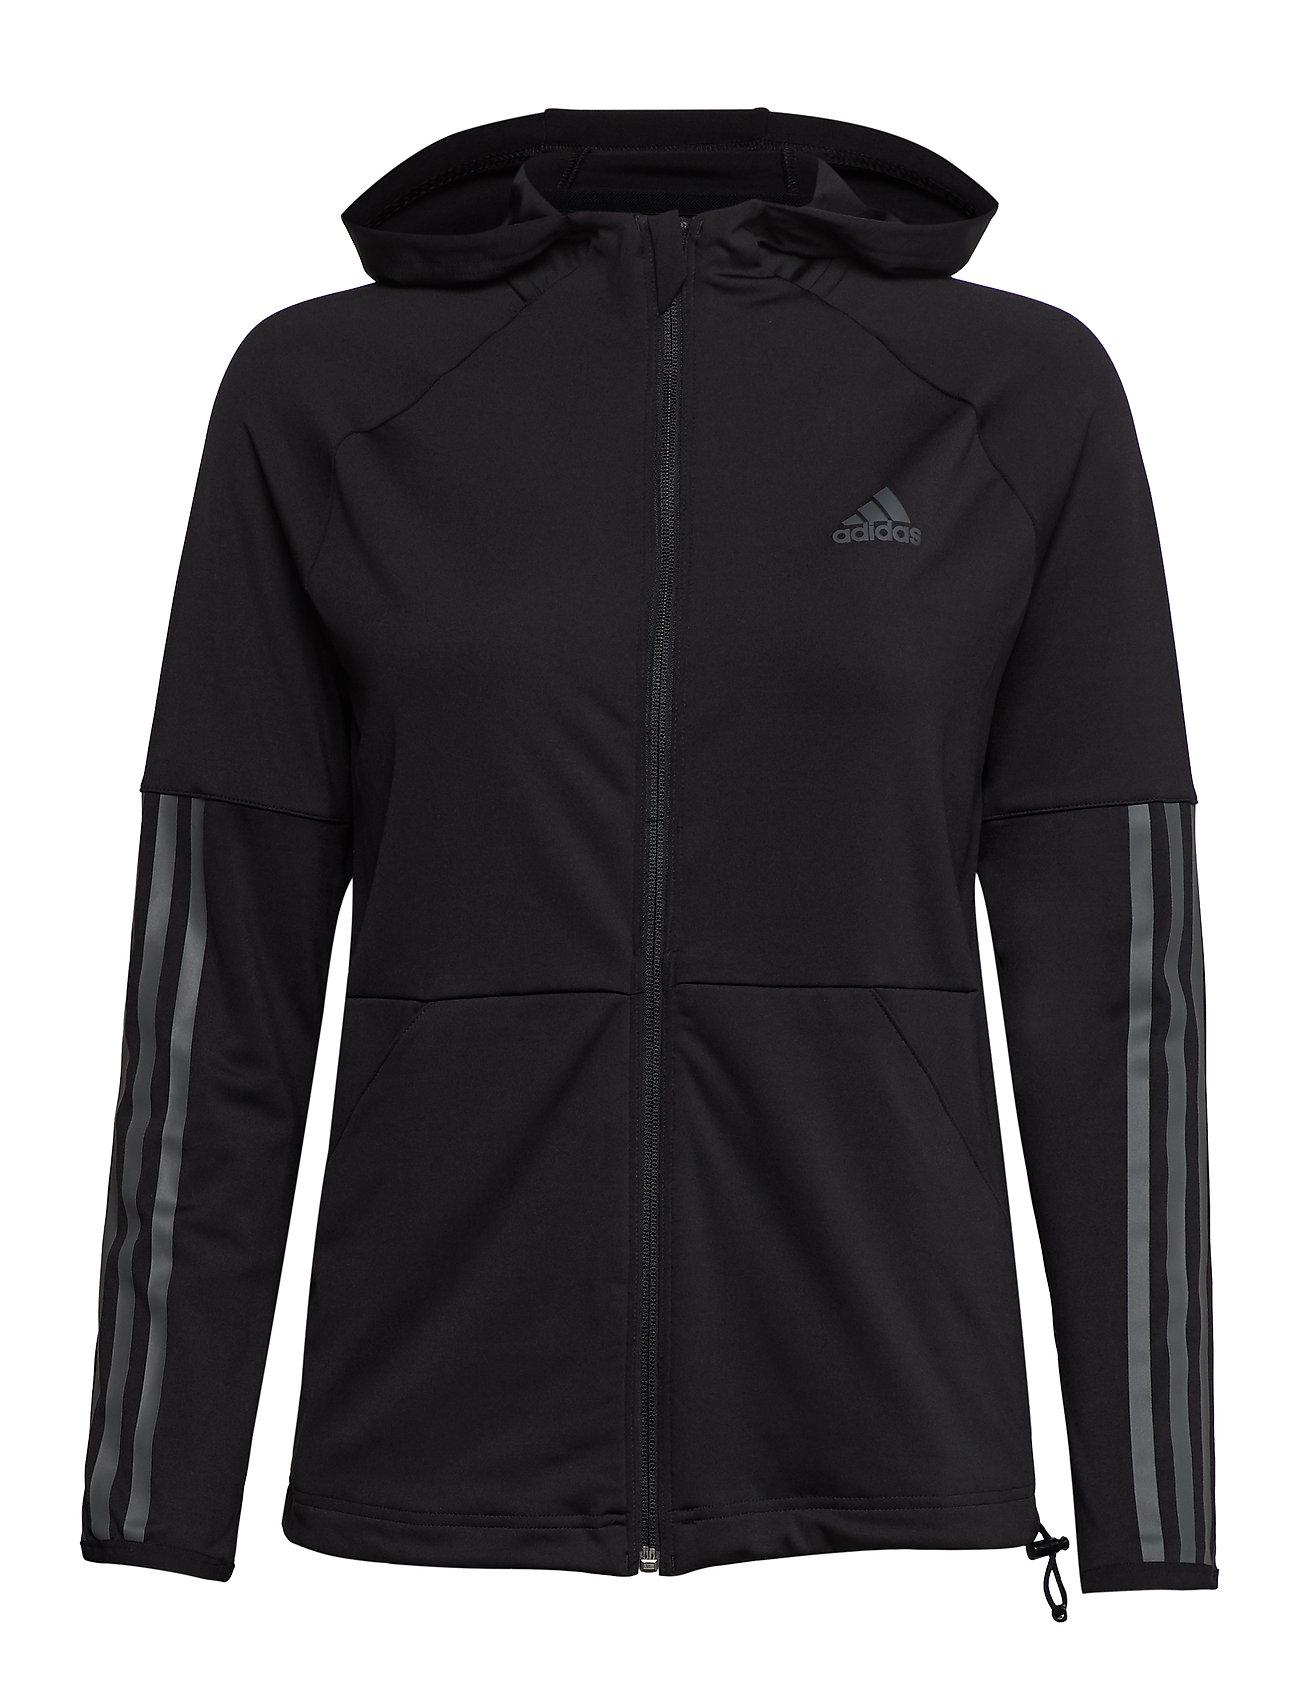 adidas Performance 3S FZ HOODIE - BLACK